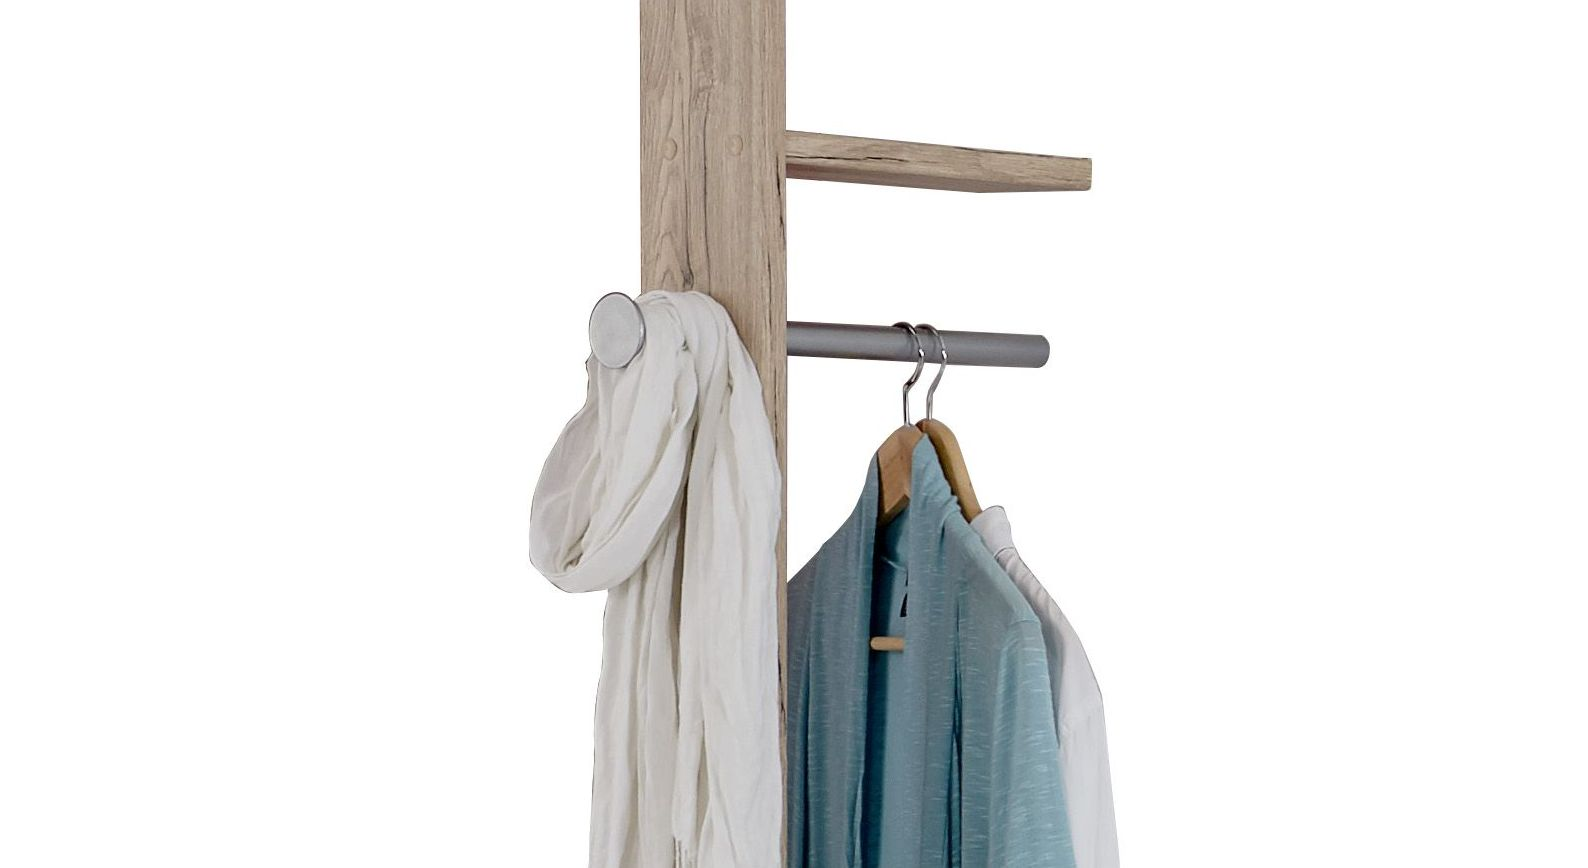 Anbau-Garderobe Tropea inklusive Metall-Kleiderstange